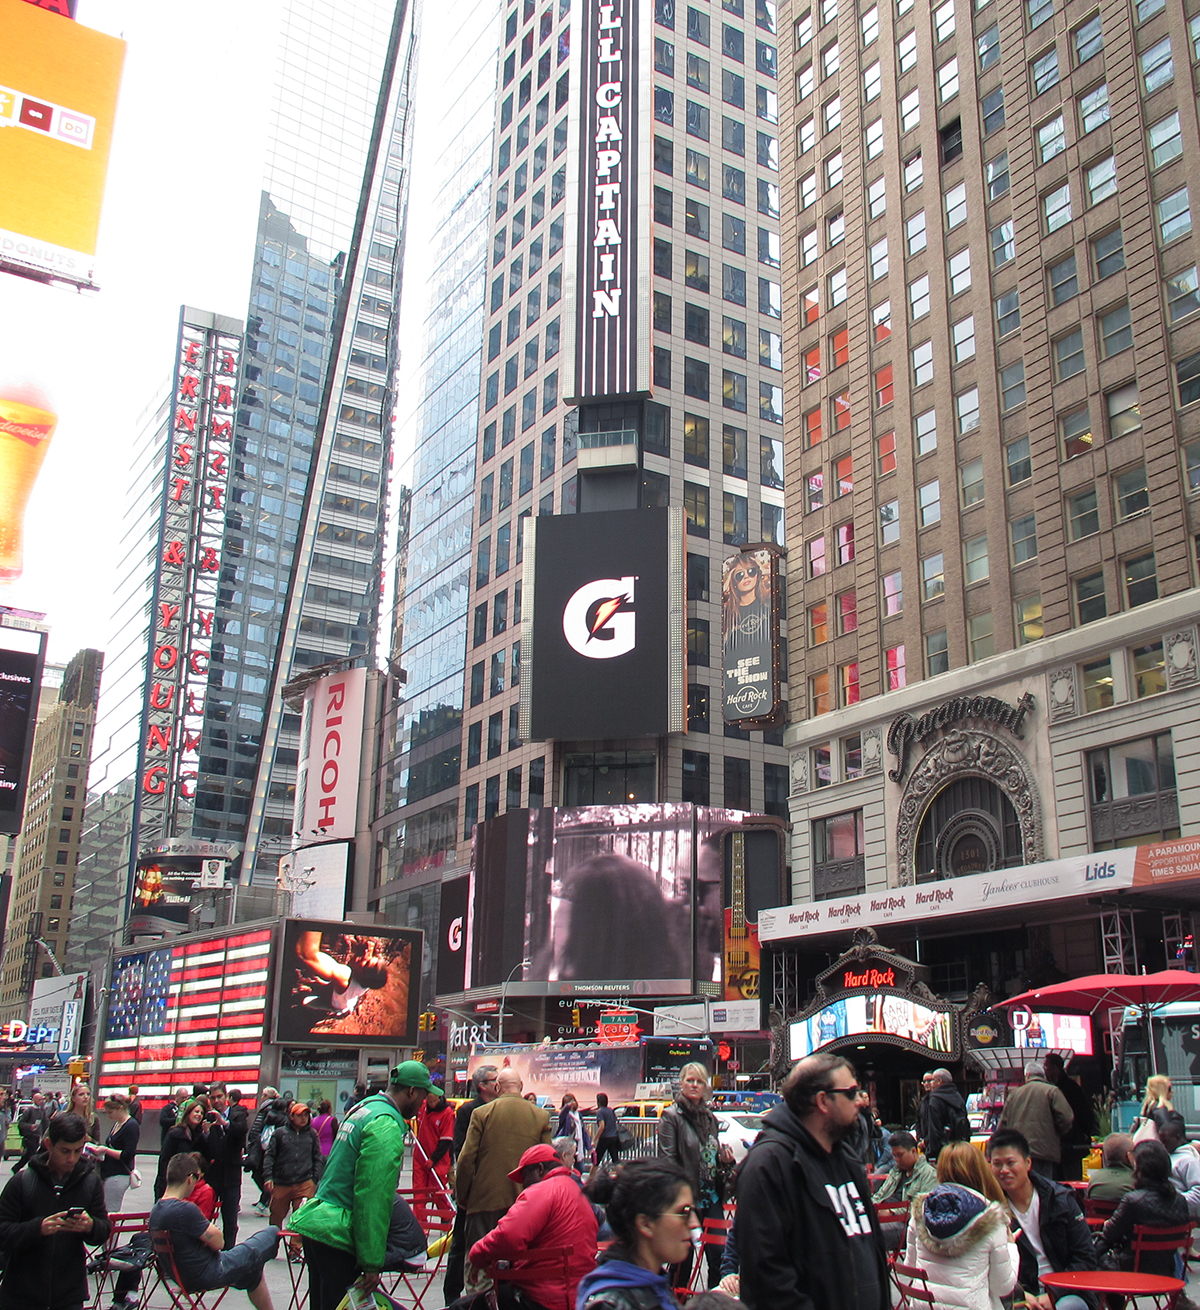 Gatorade: Made in New York